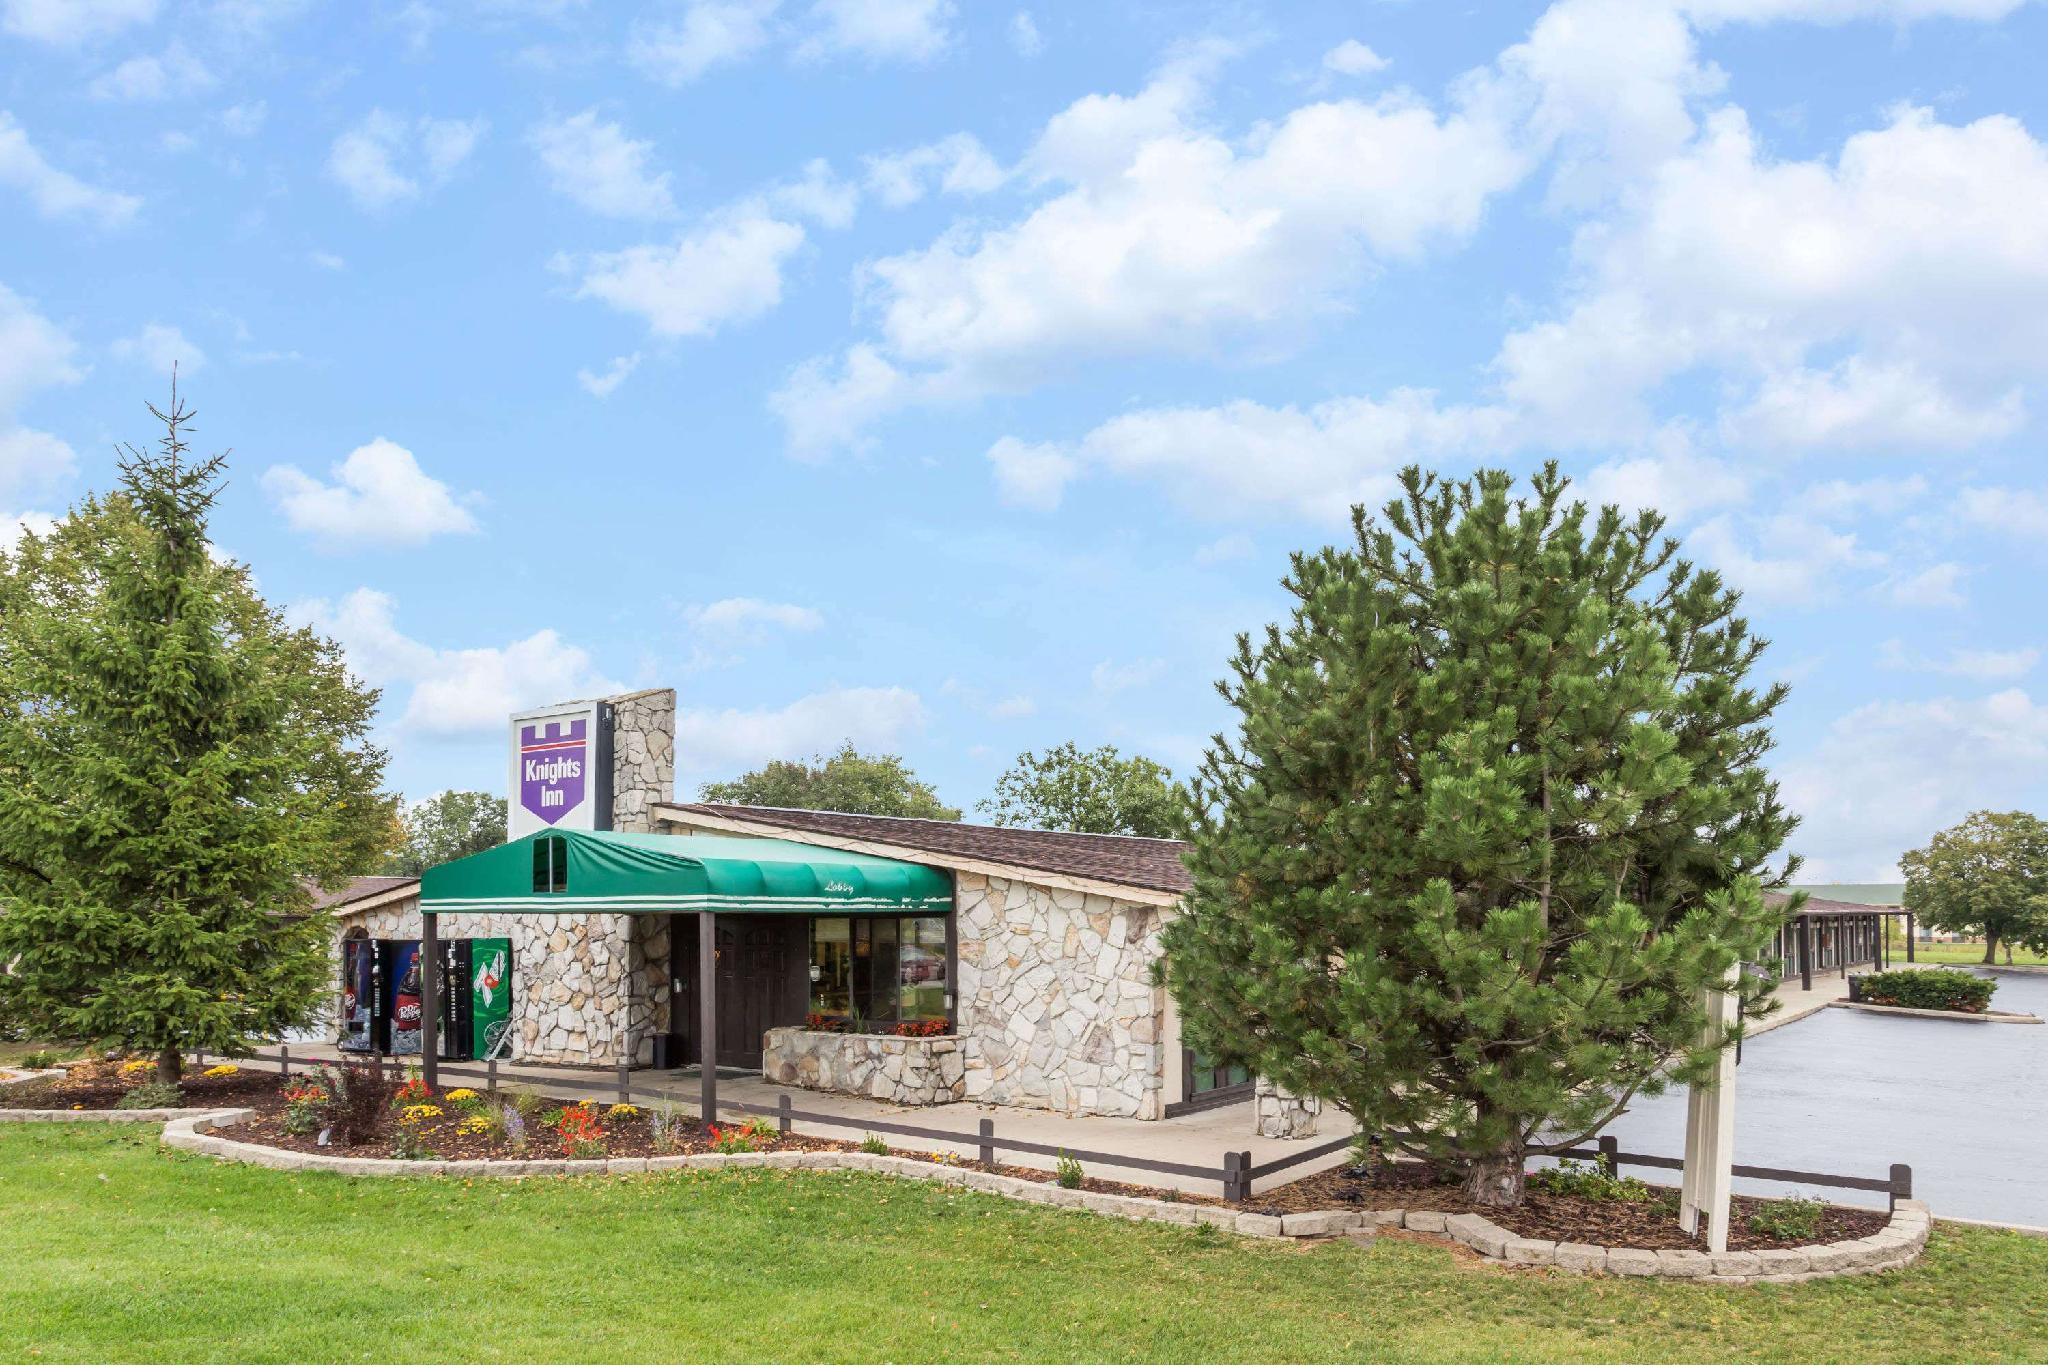 Knights Inn - Racine, WI, Racine